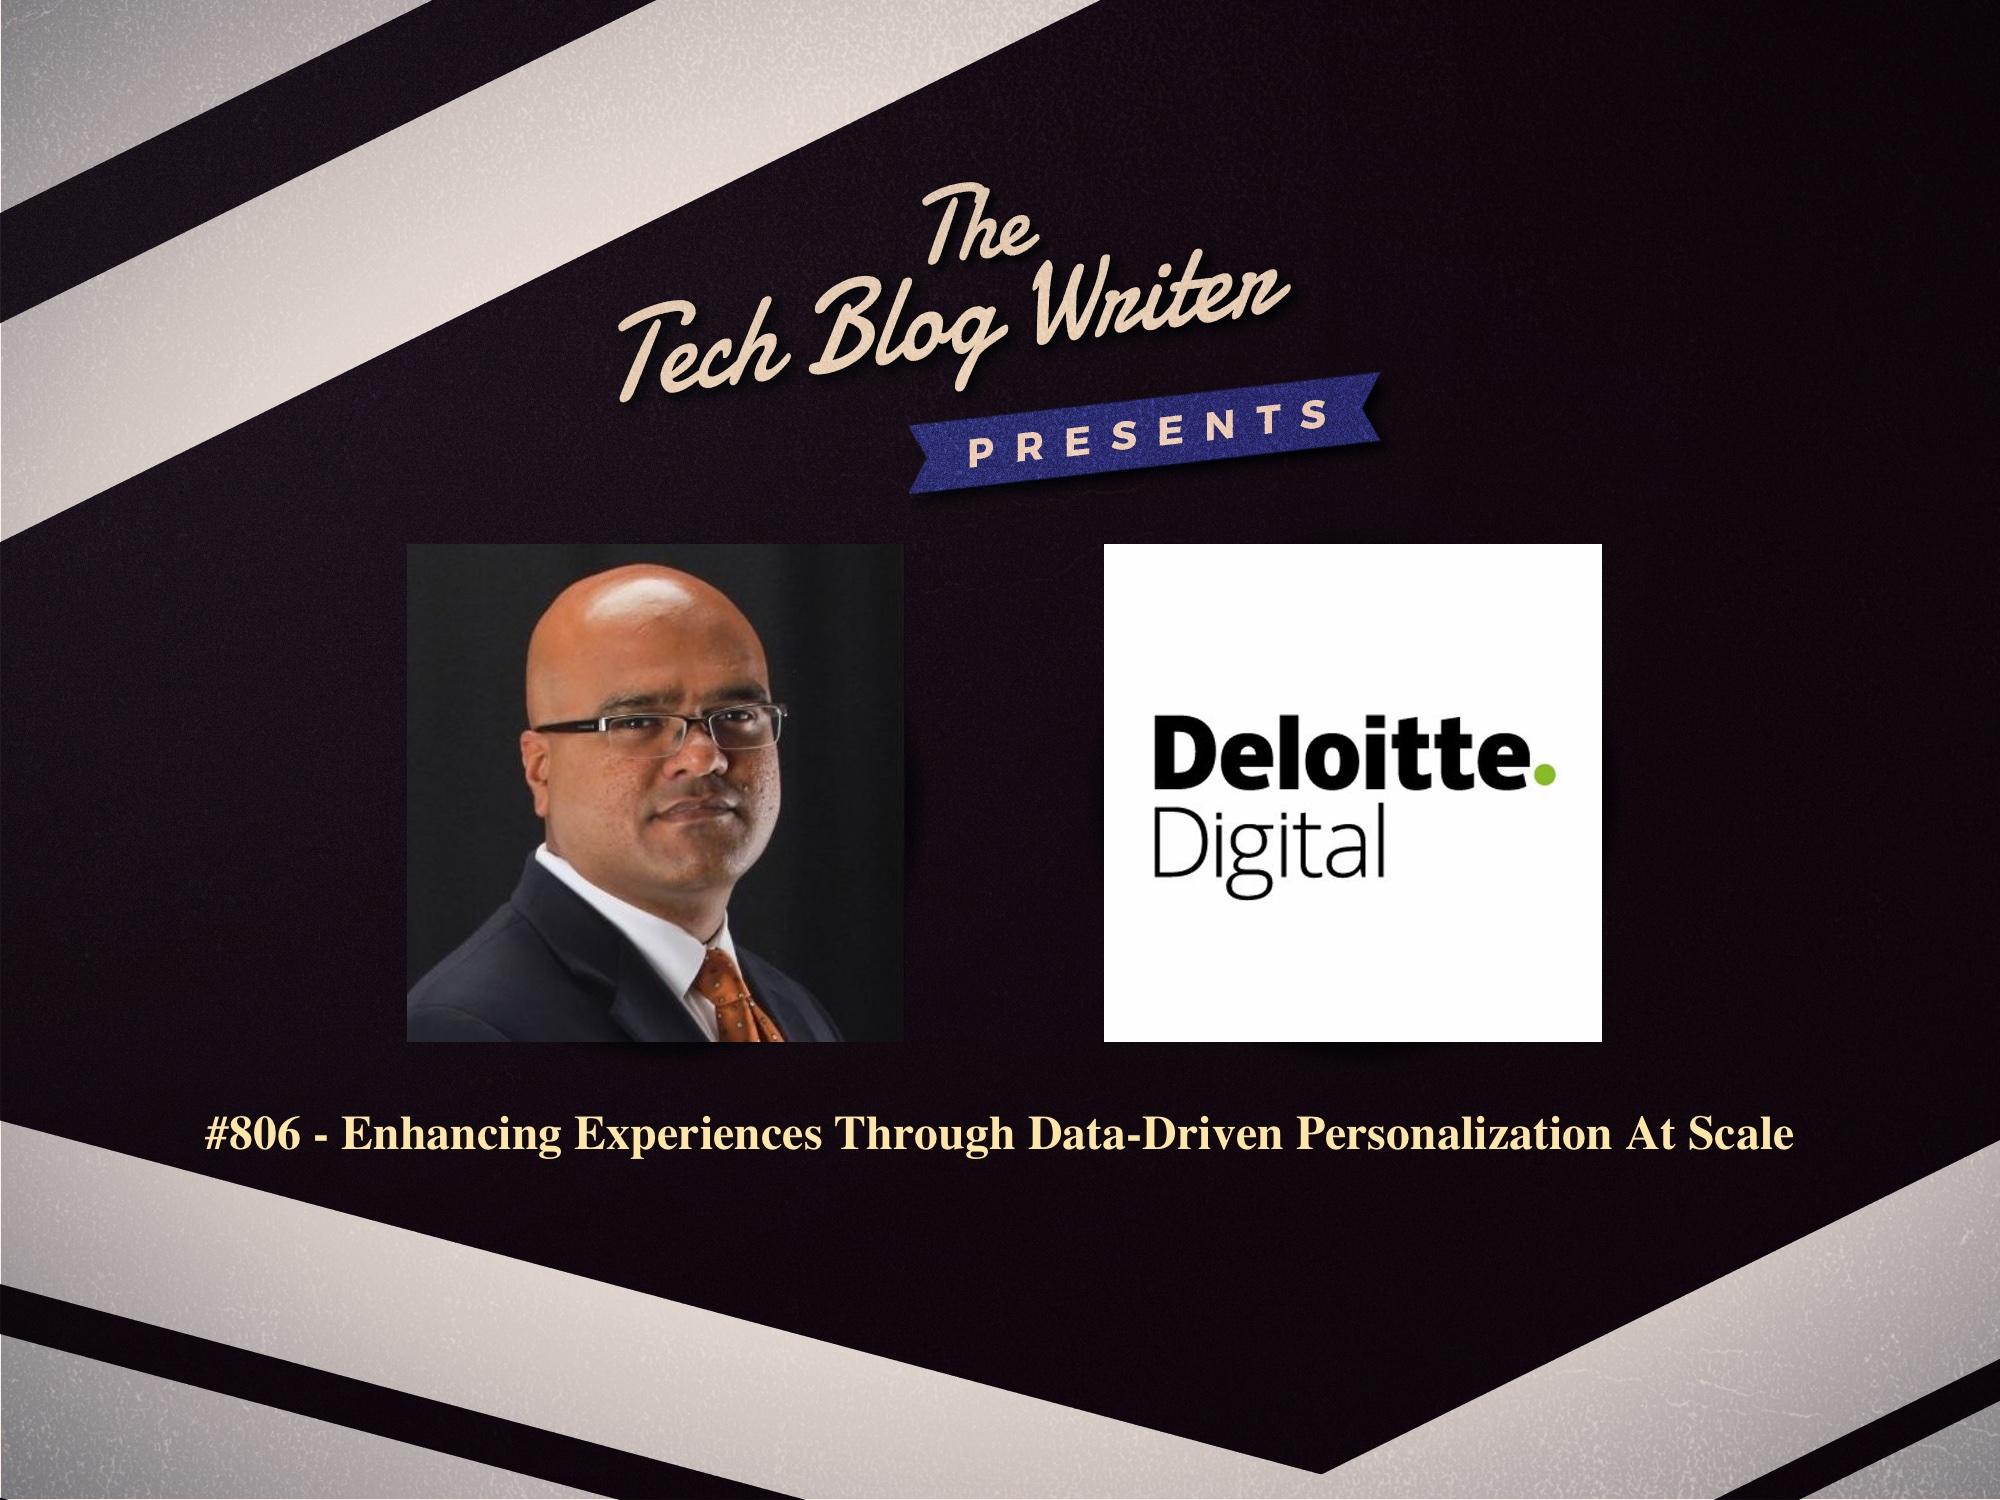 Deloitte Digital - Enhancing Experiences Through Personalization